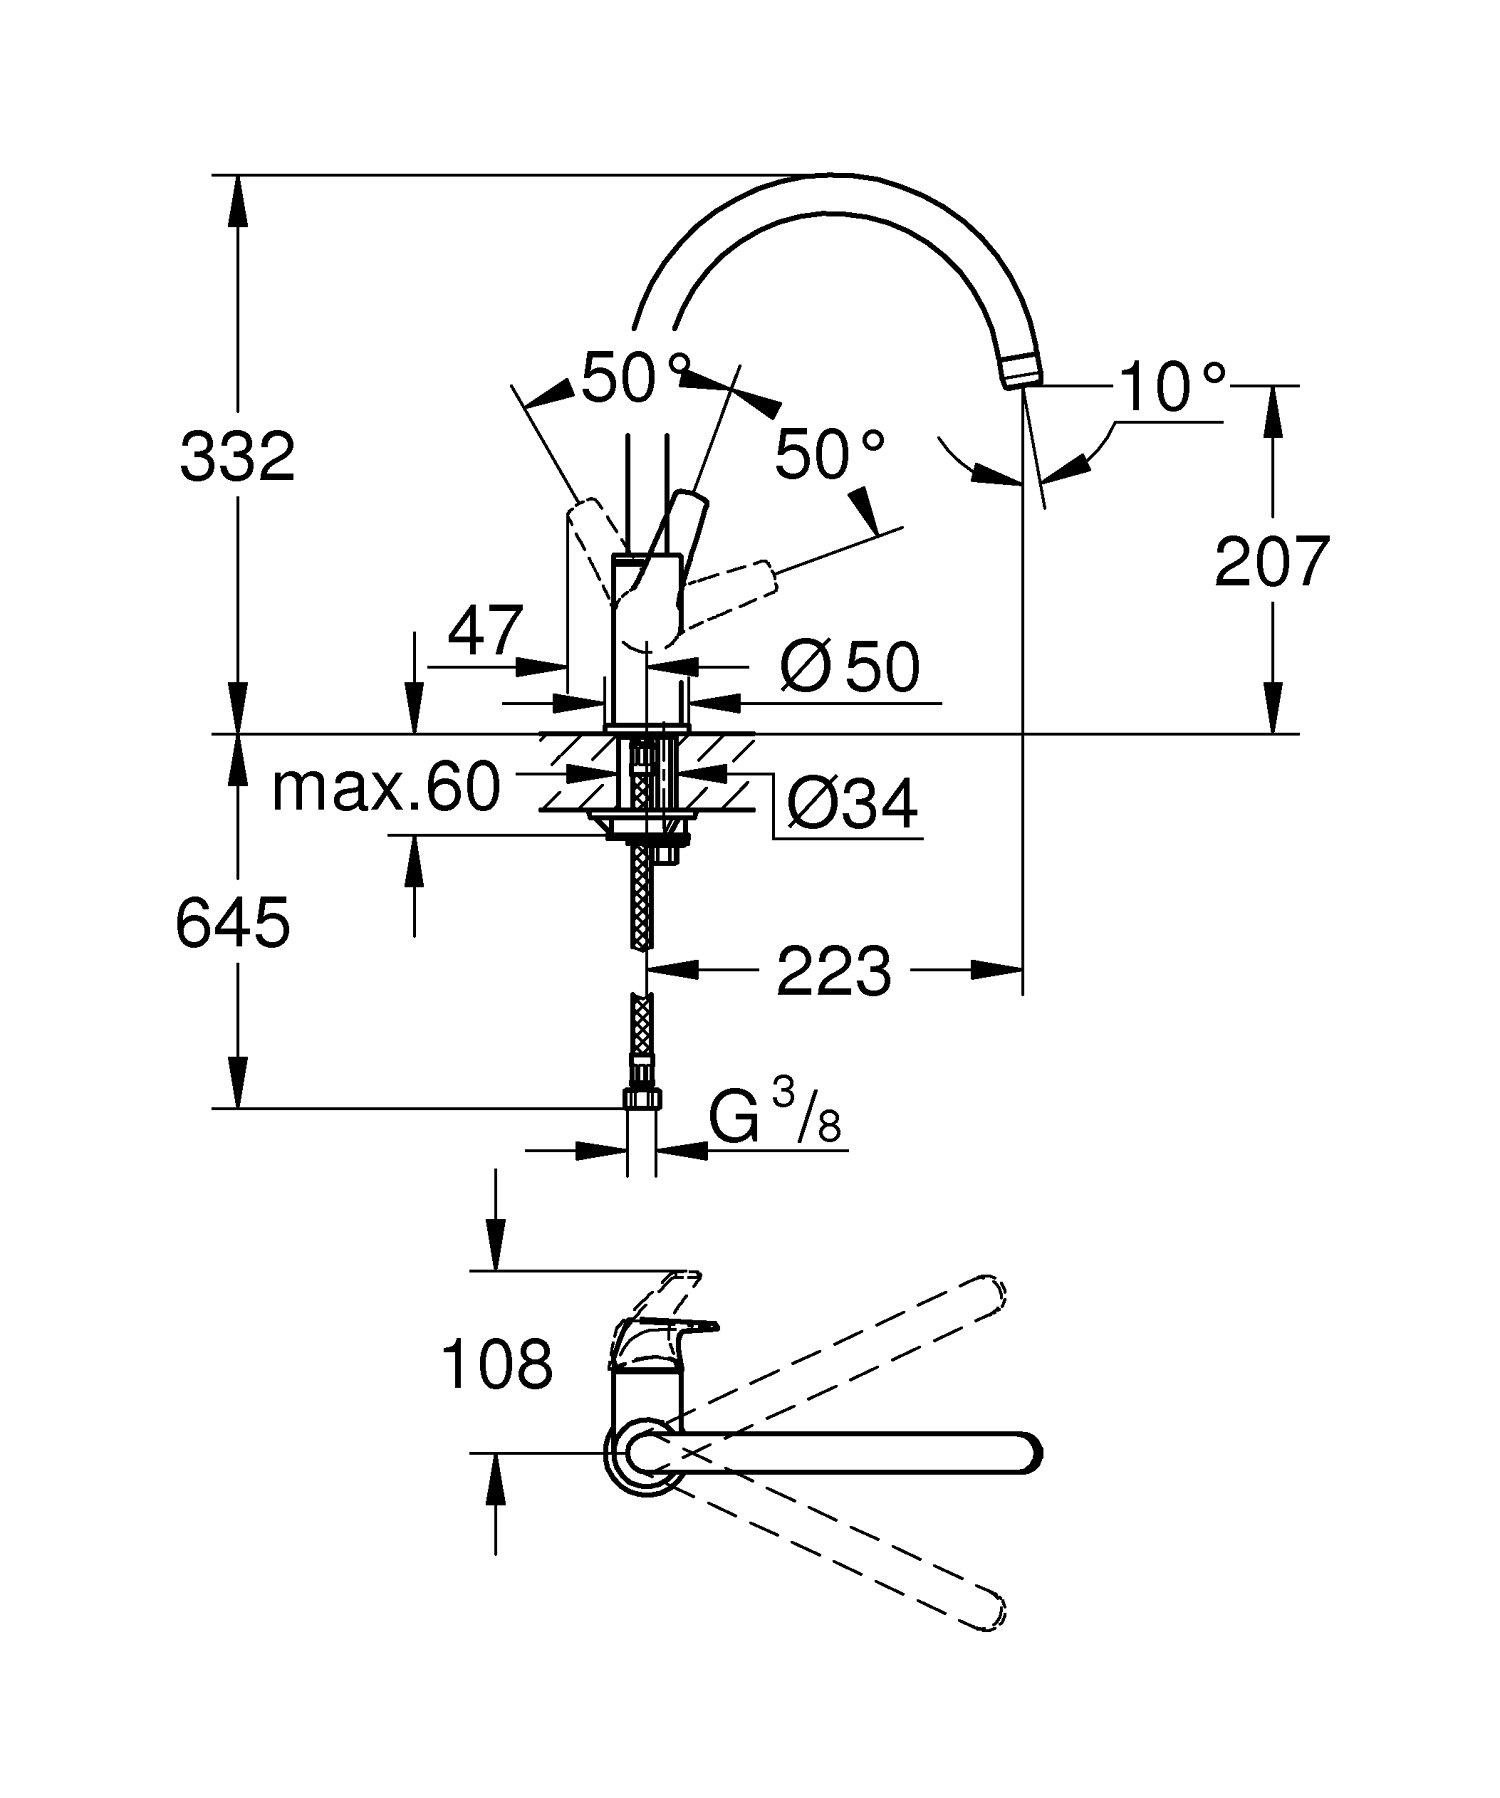 Grohe BauEdge – Grifo de cocina monomando para instalación en un solo agujero con caño alto giratorio en un ángulo de 360° (Ref. 31367000)